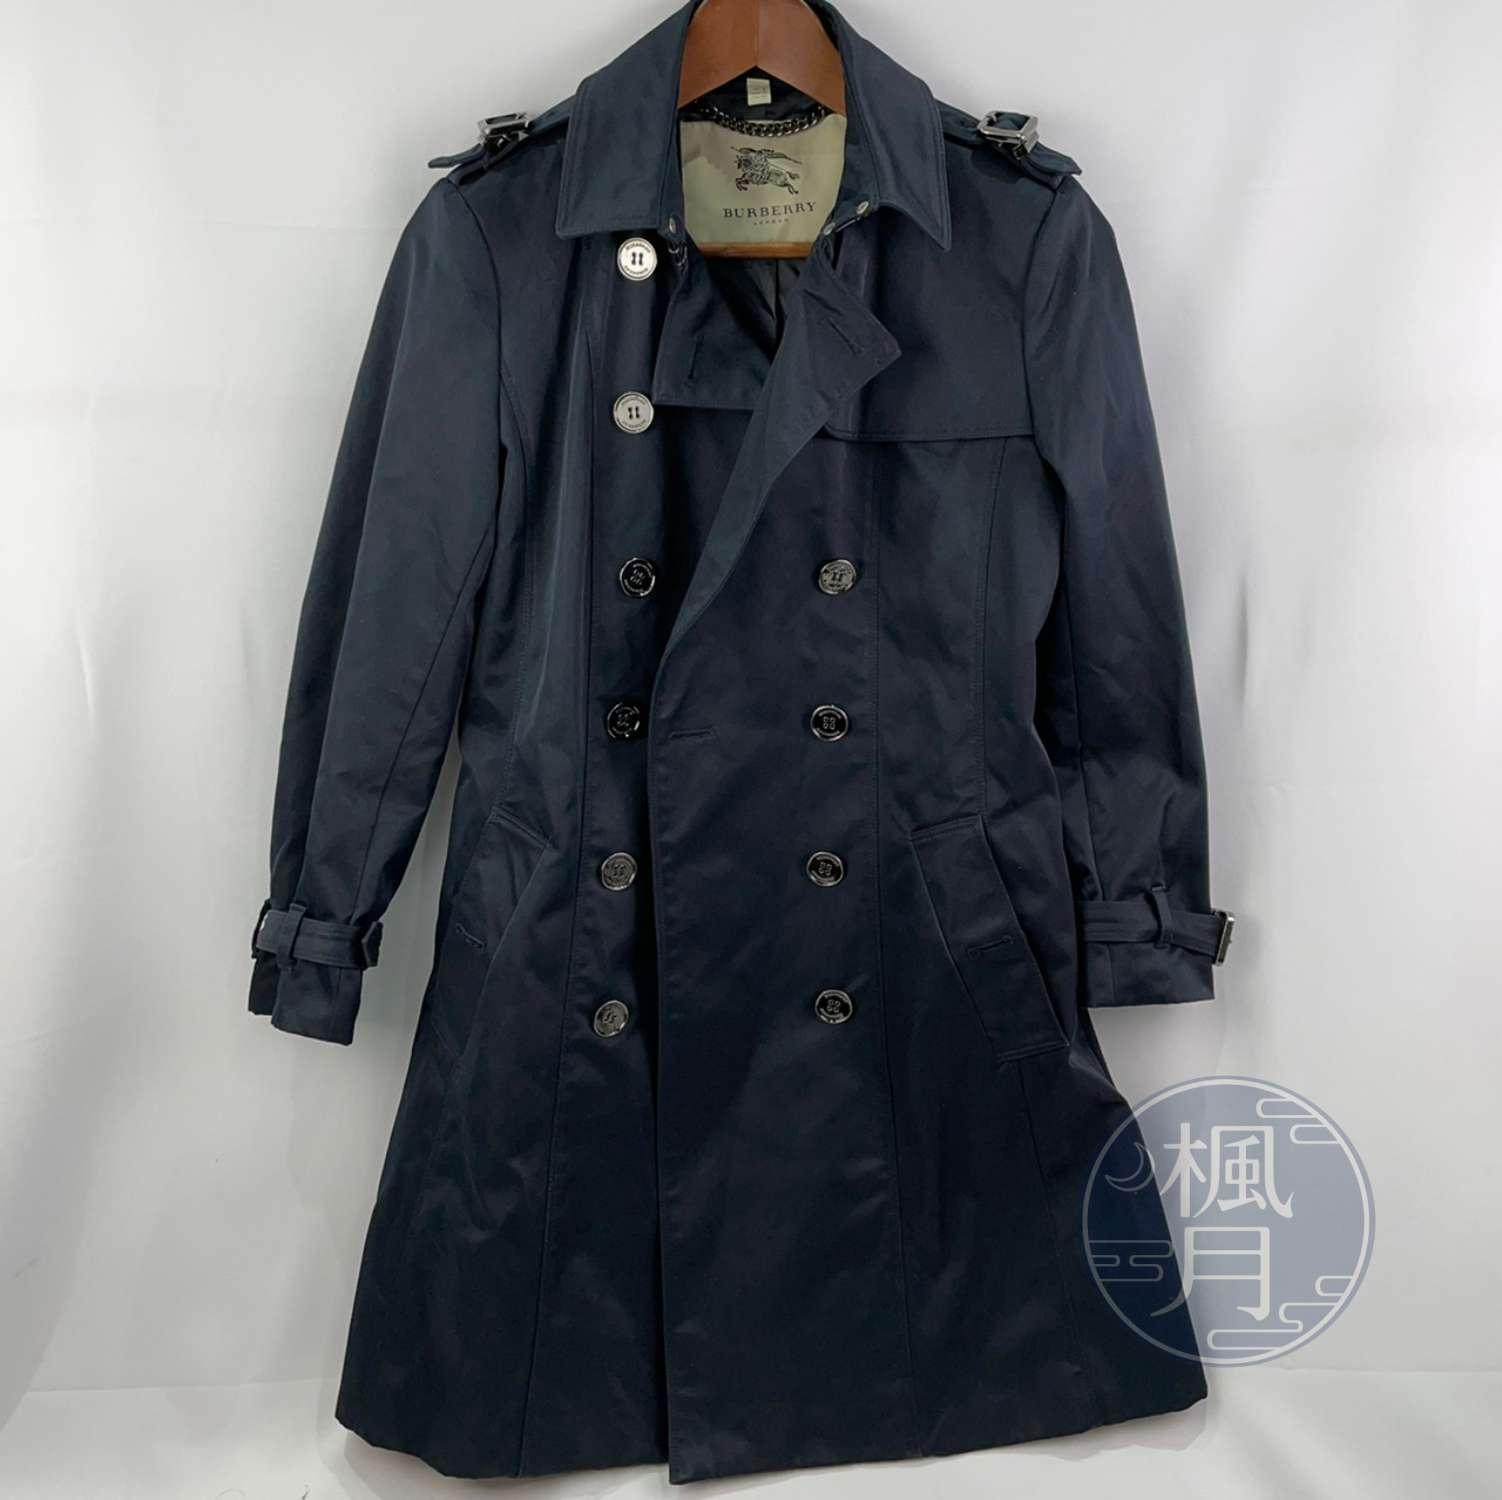 BRAND楓月 BURBERRY 博柏利 深藍風衣 雙排釦 經典 格紋內裡 長版風衣 保暖 防風 #UK10